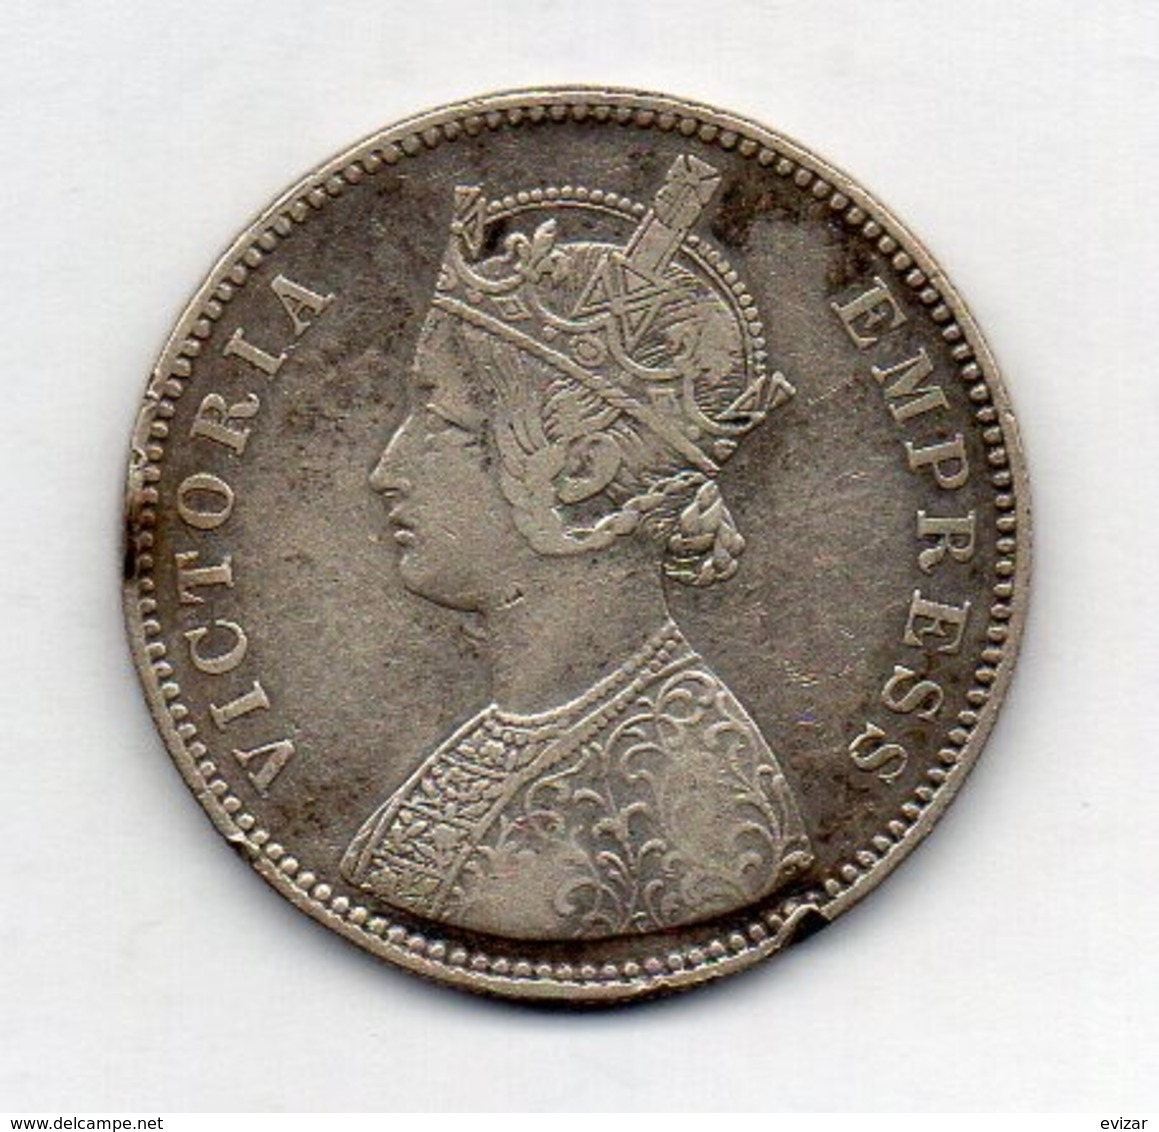 INDE - ALWAR, 1 Rupee, Silver, 1880, KM #45 - India